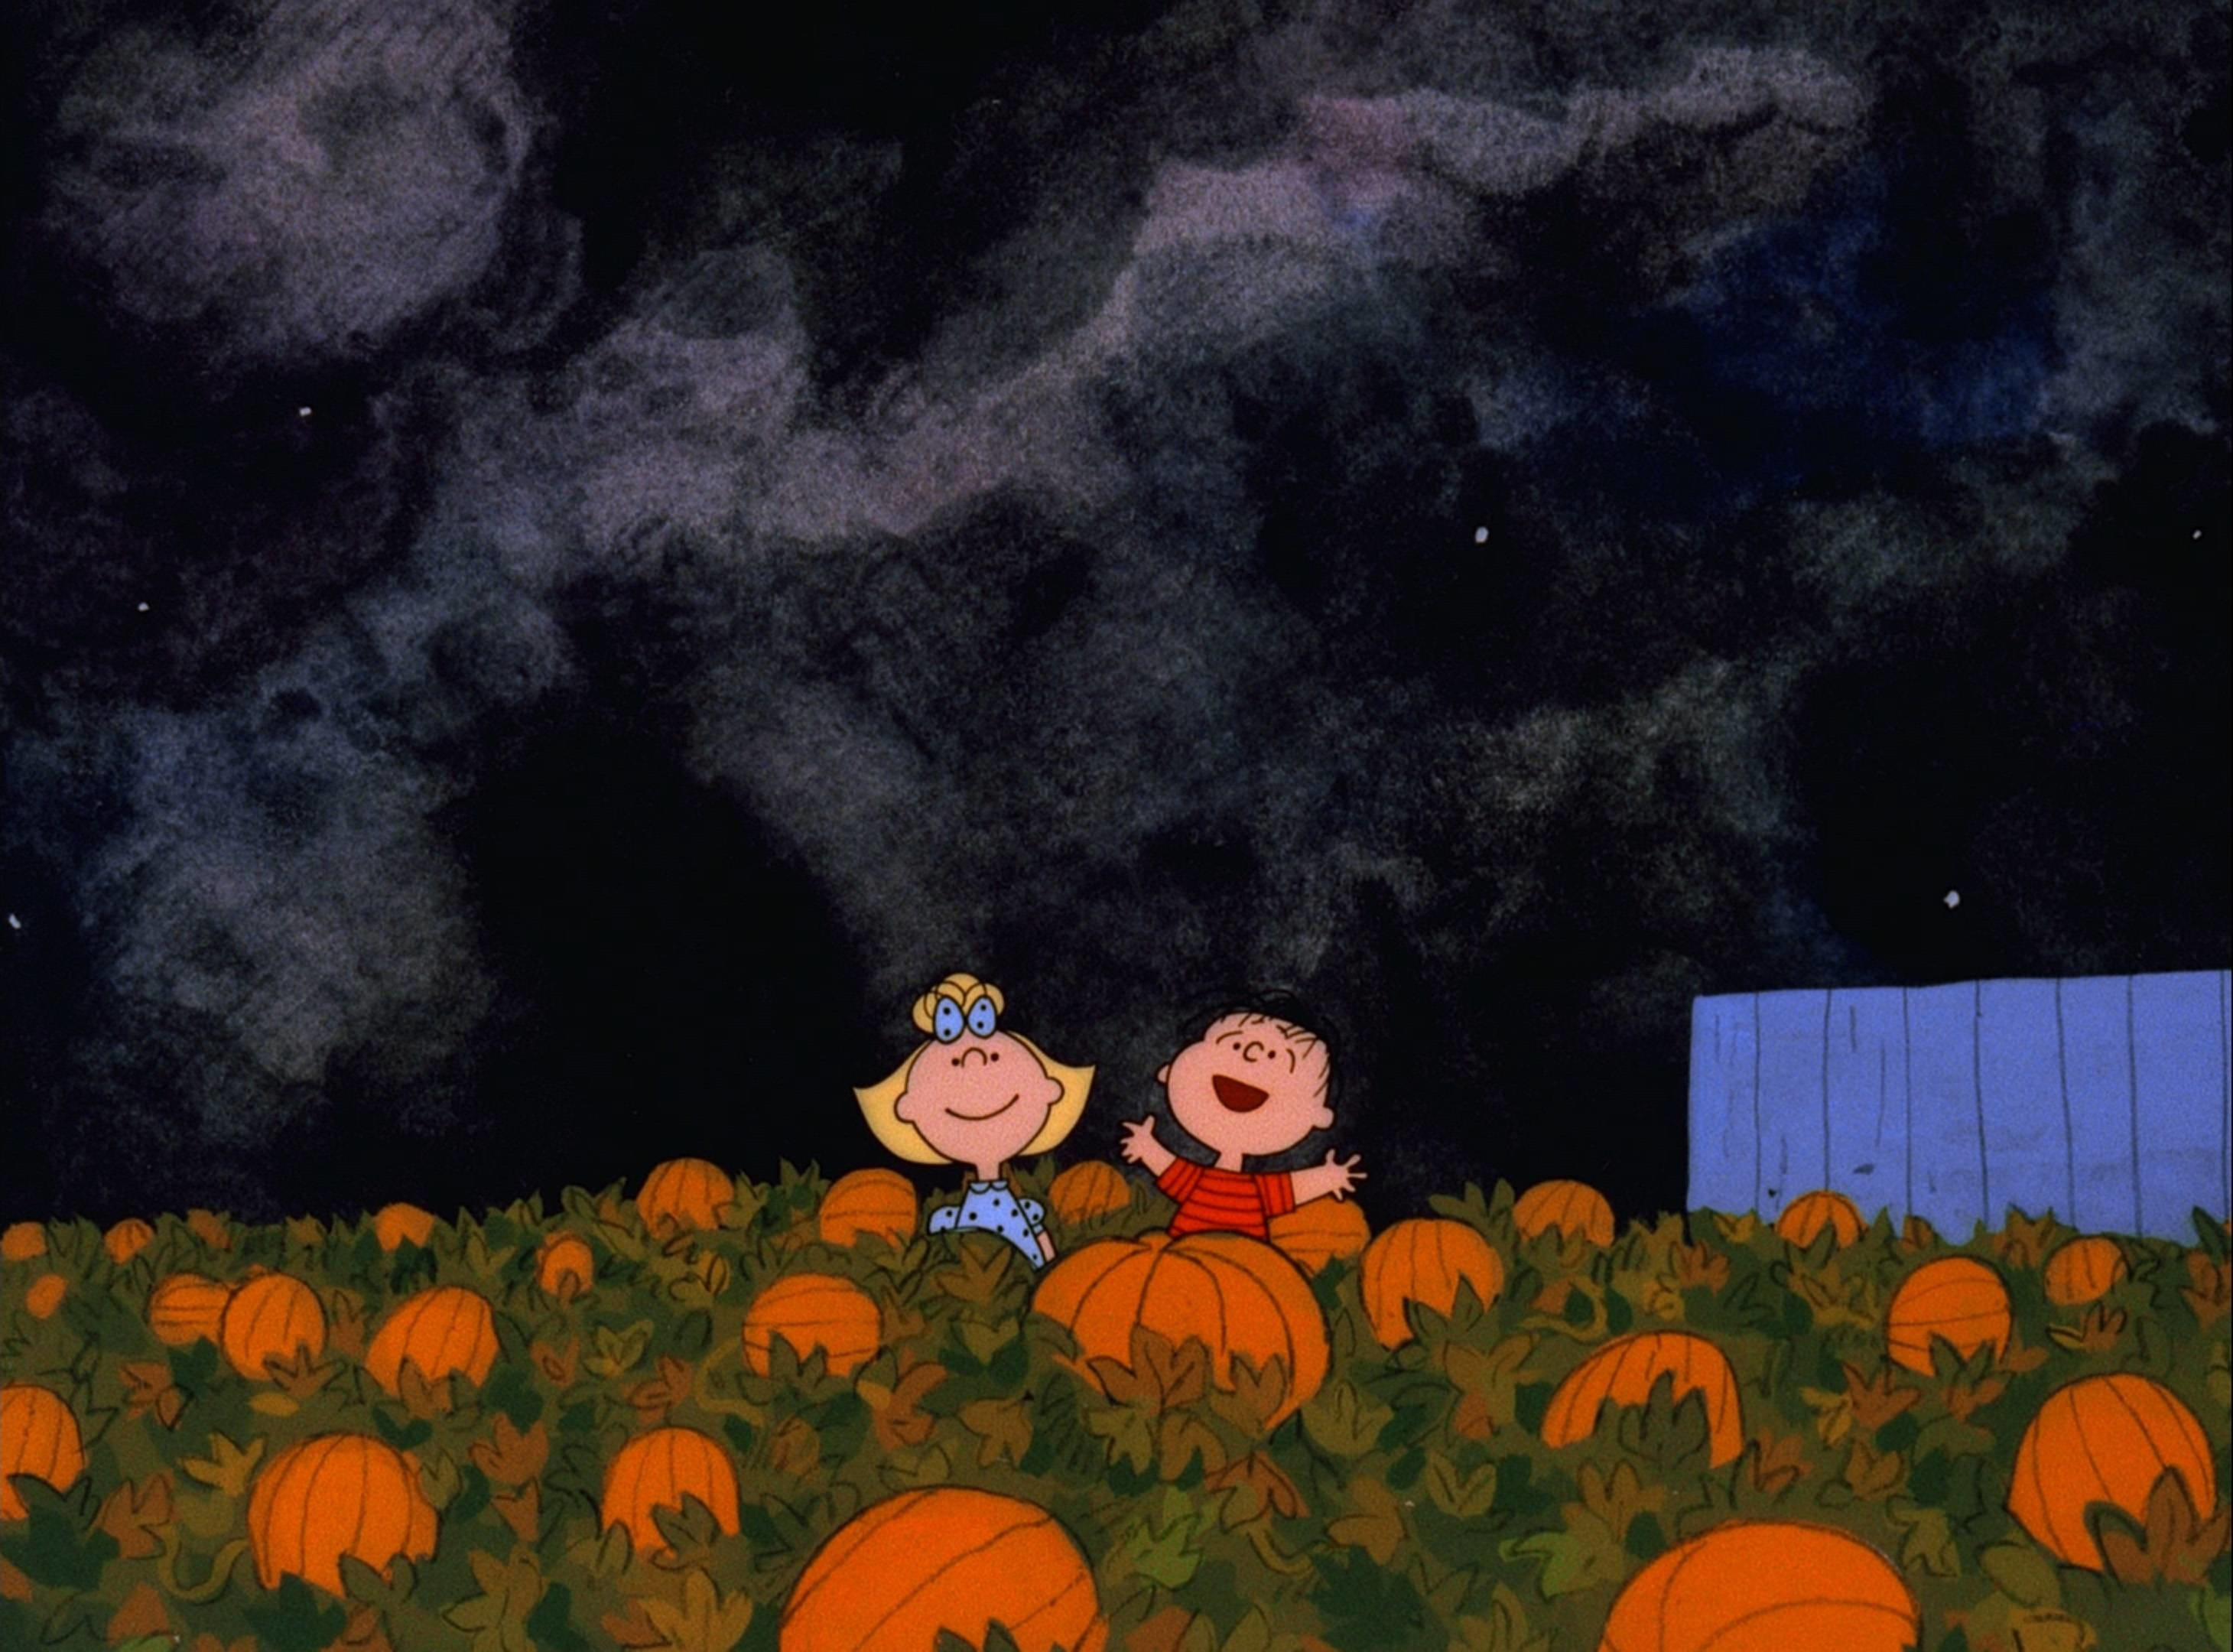 Halloween Pumpkin Wallpaper Iphone.Pumpkin Wallpaper Backgrounds 57 Pictures